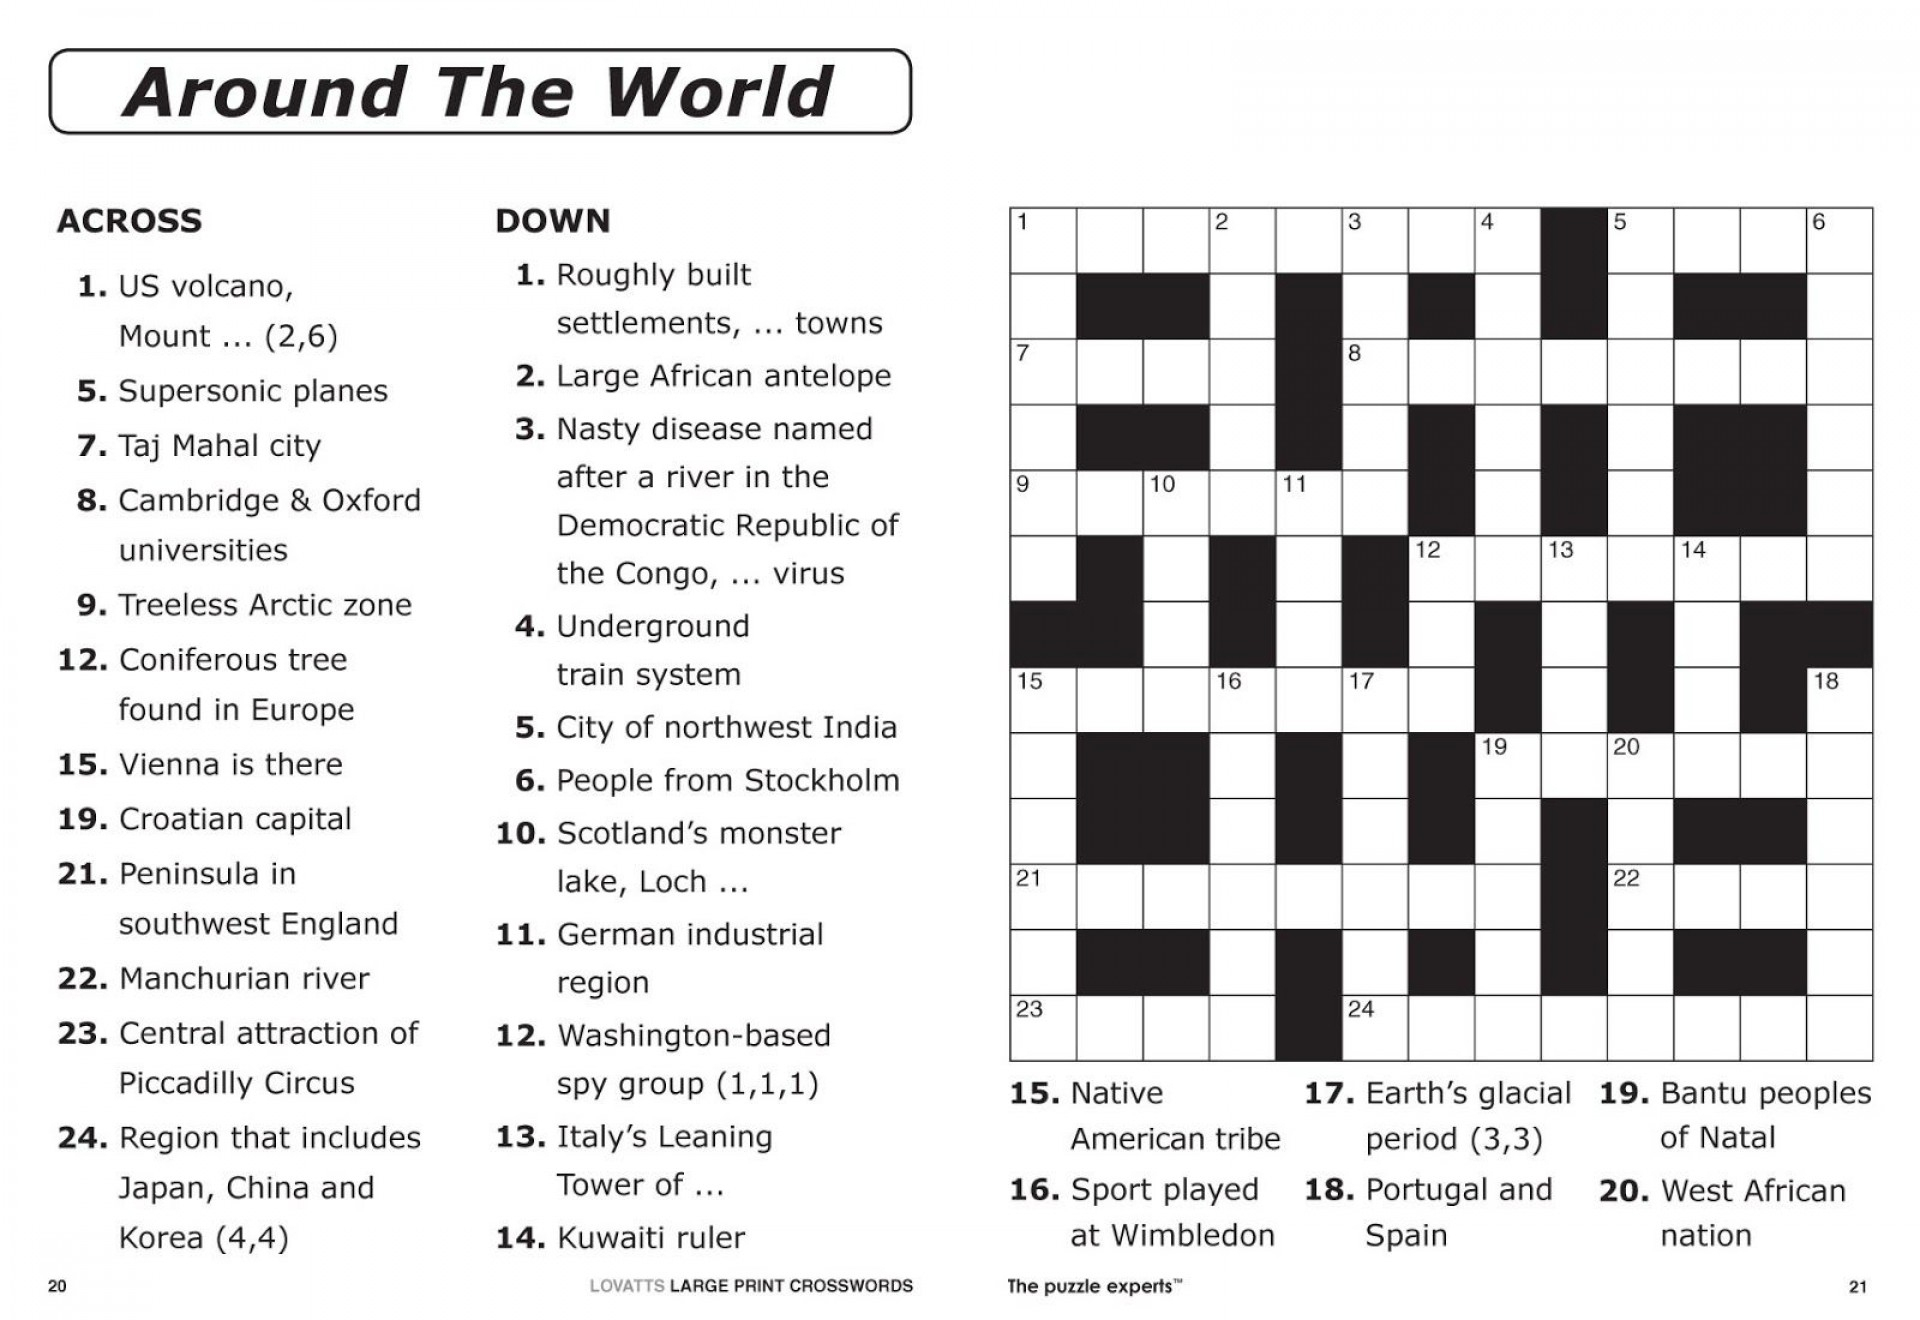 Coloring ~ Coloring Easy Printable Crossword Puzzles Large Print - Printable Jumbo Crossword